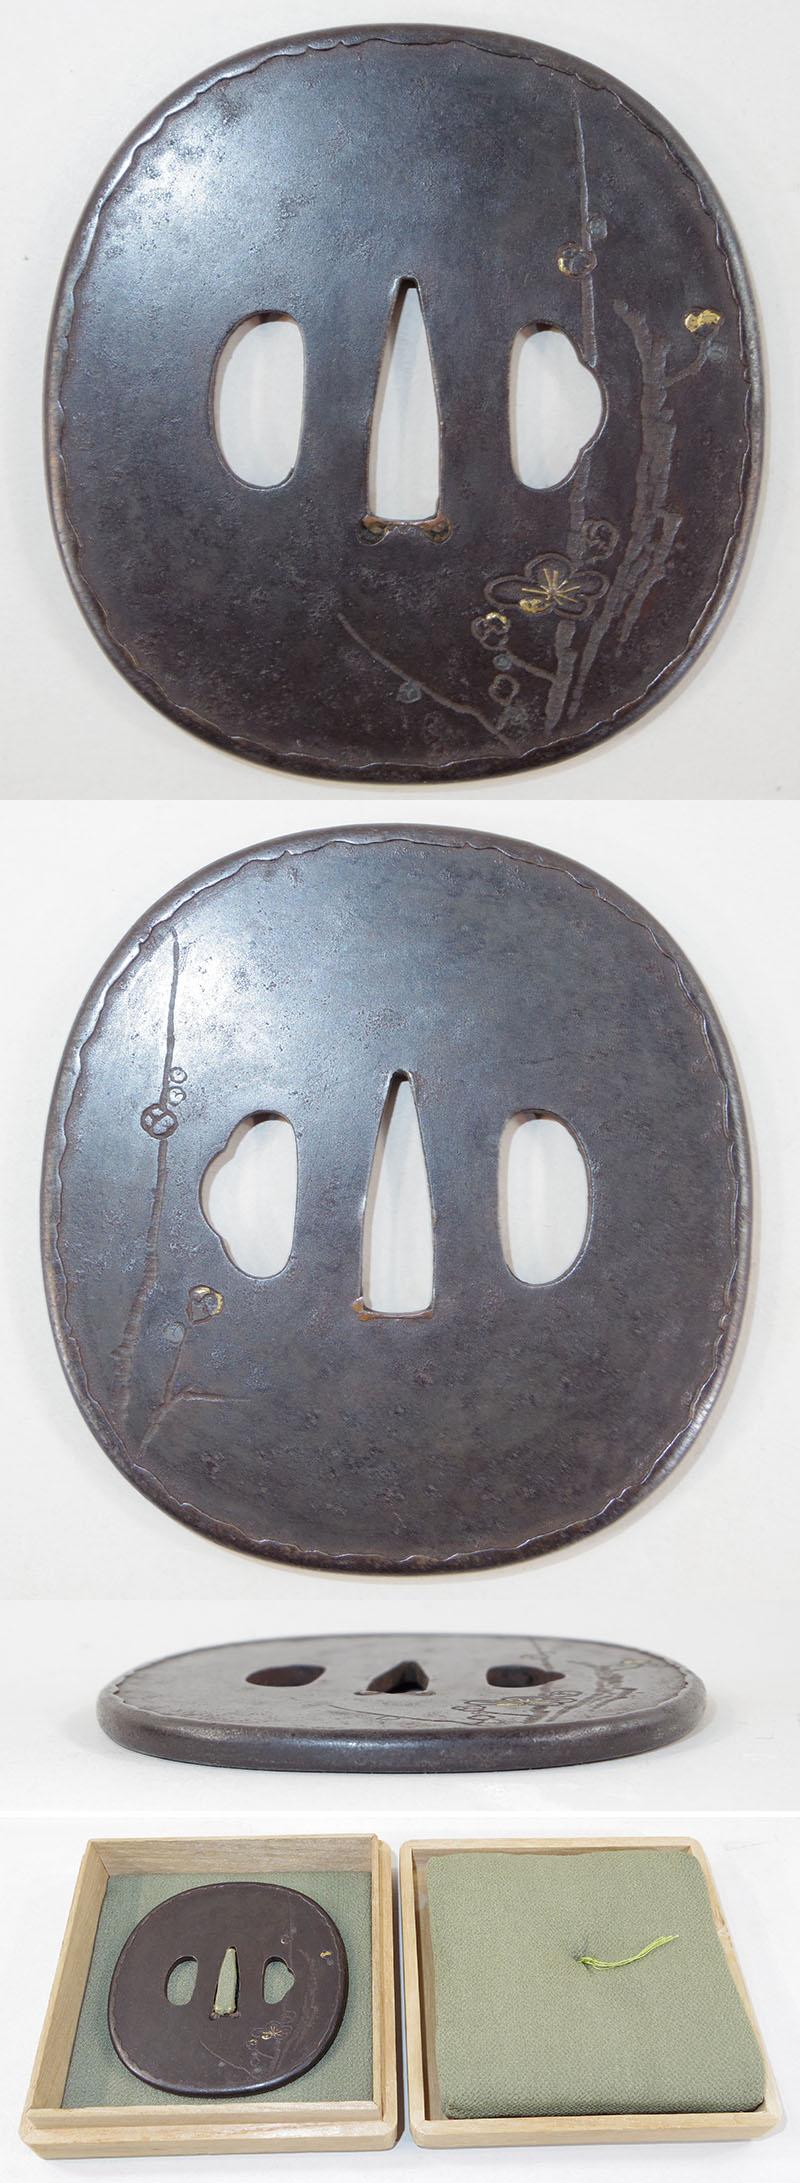 梅樹図鍔 無銘 庄内(船田派) Picture of parts